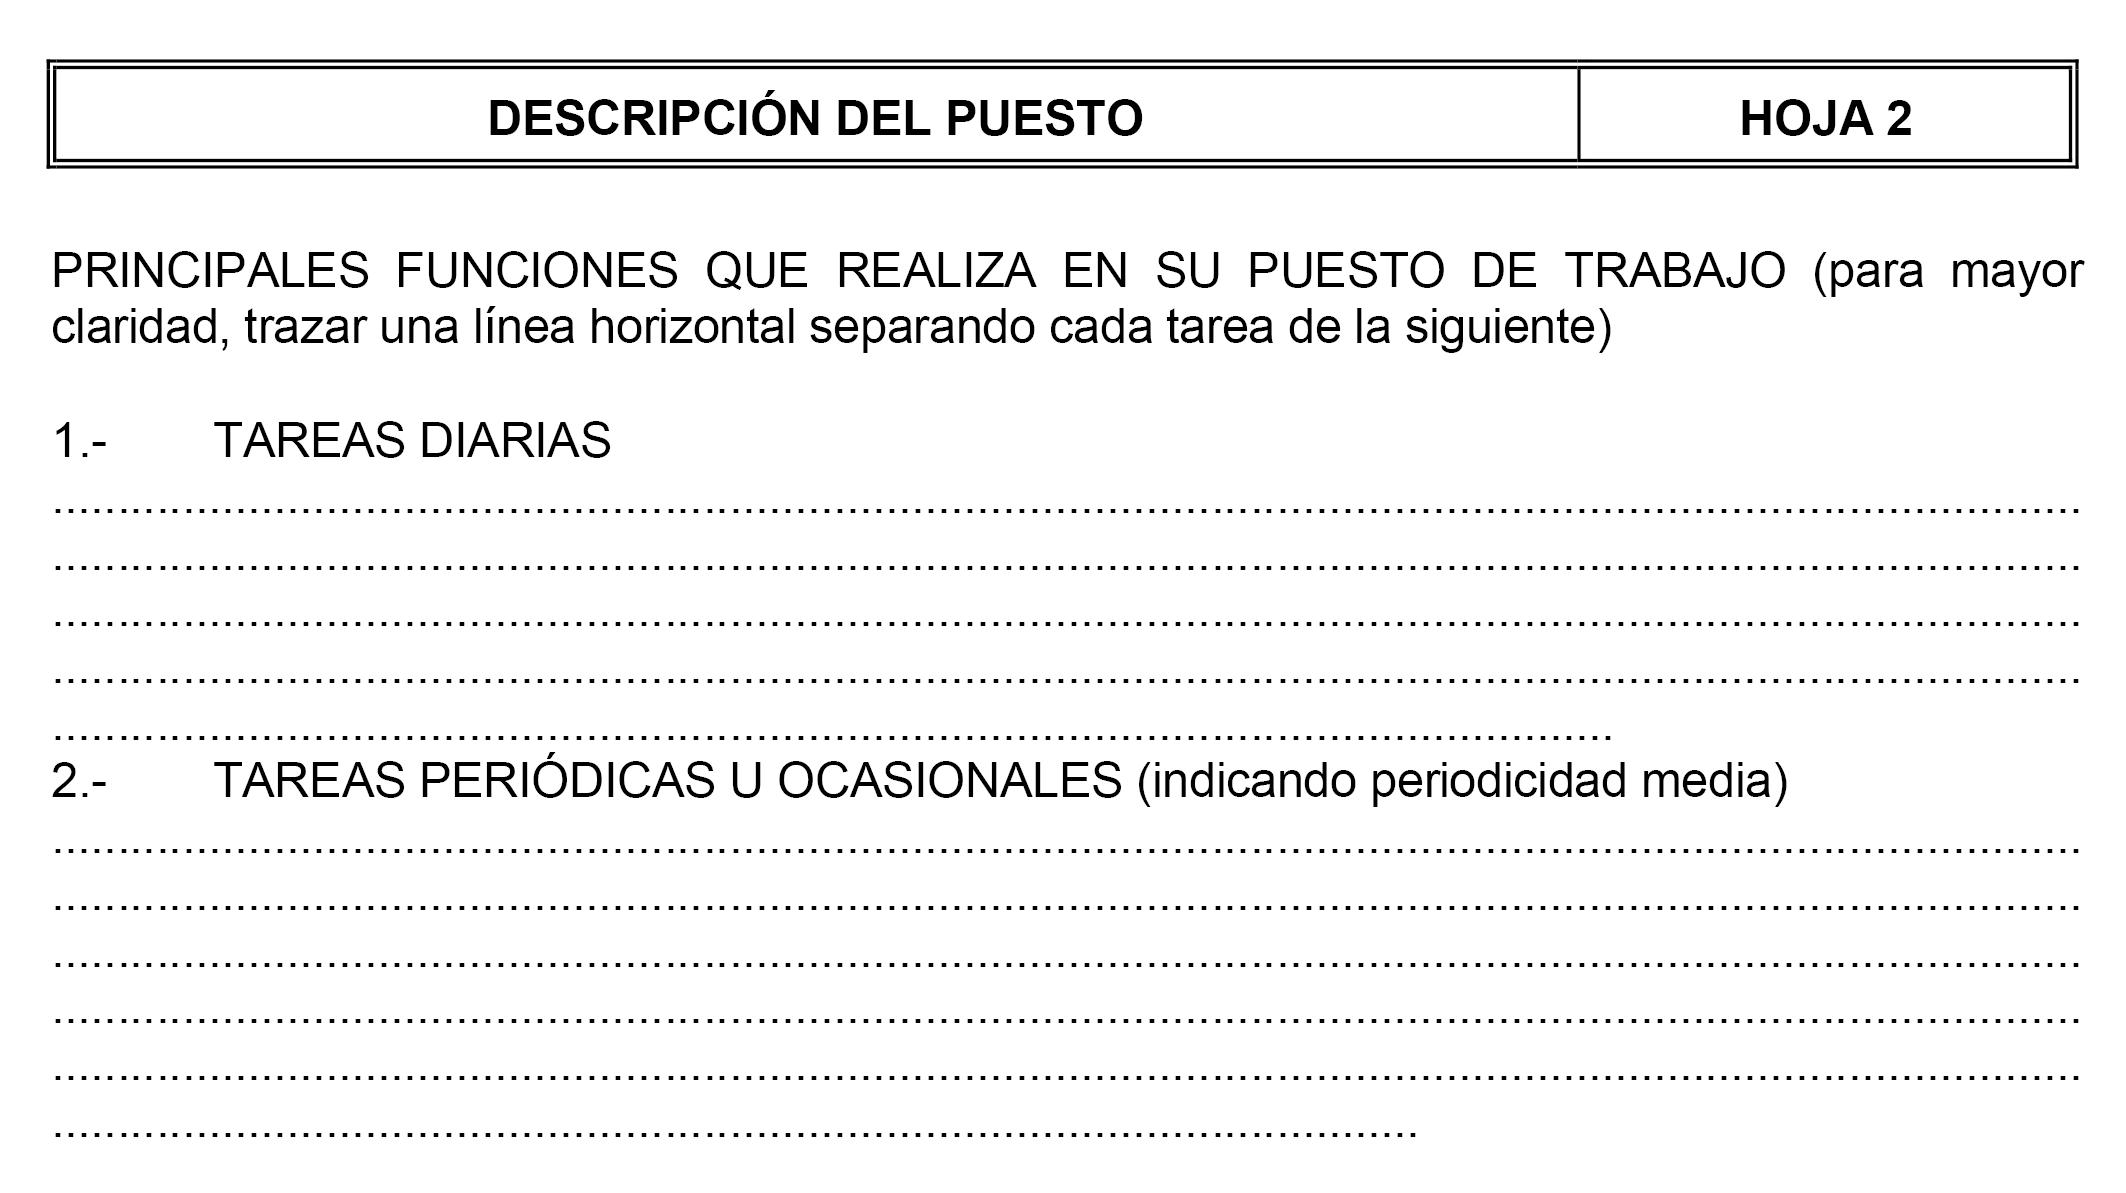 BOE.es - Documento BOE-A-2015-9304